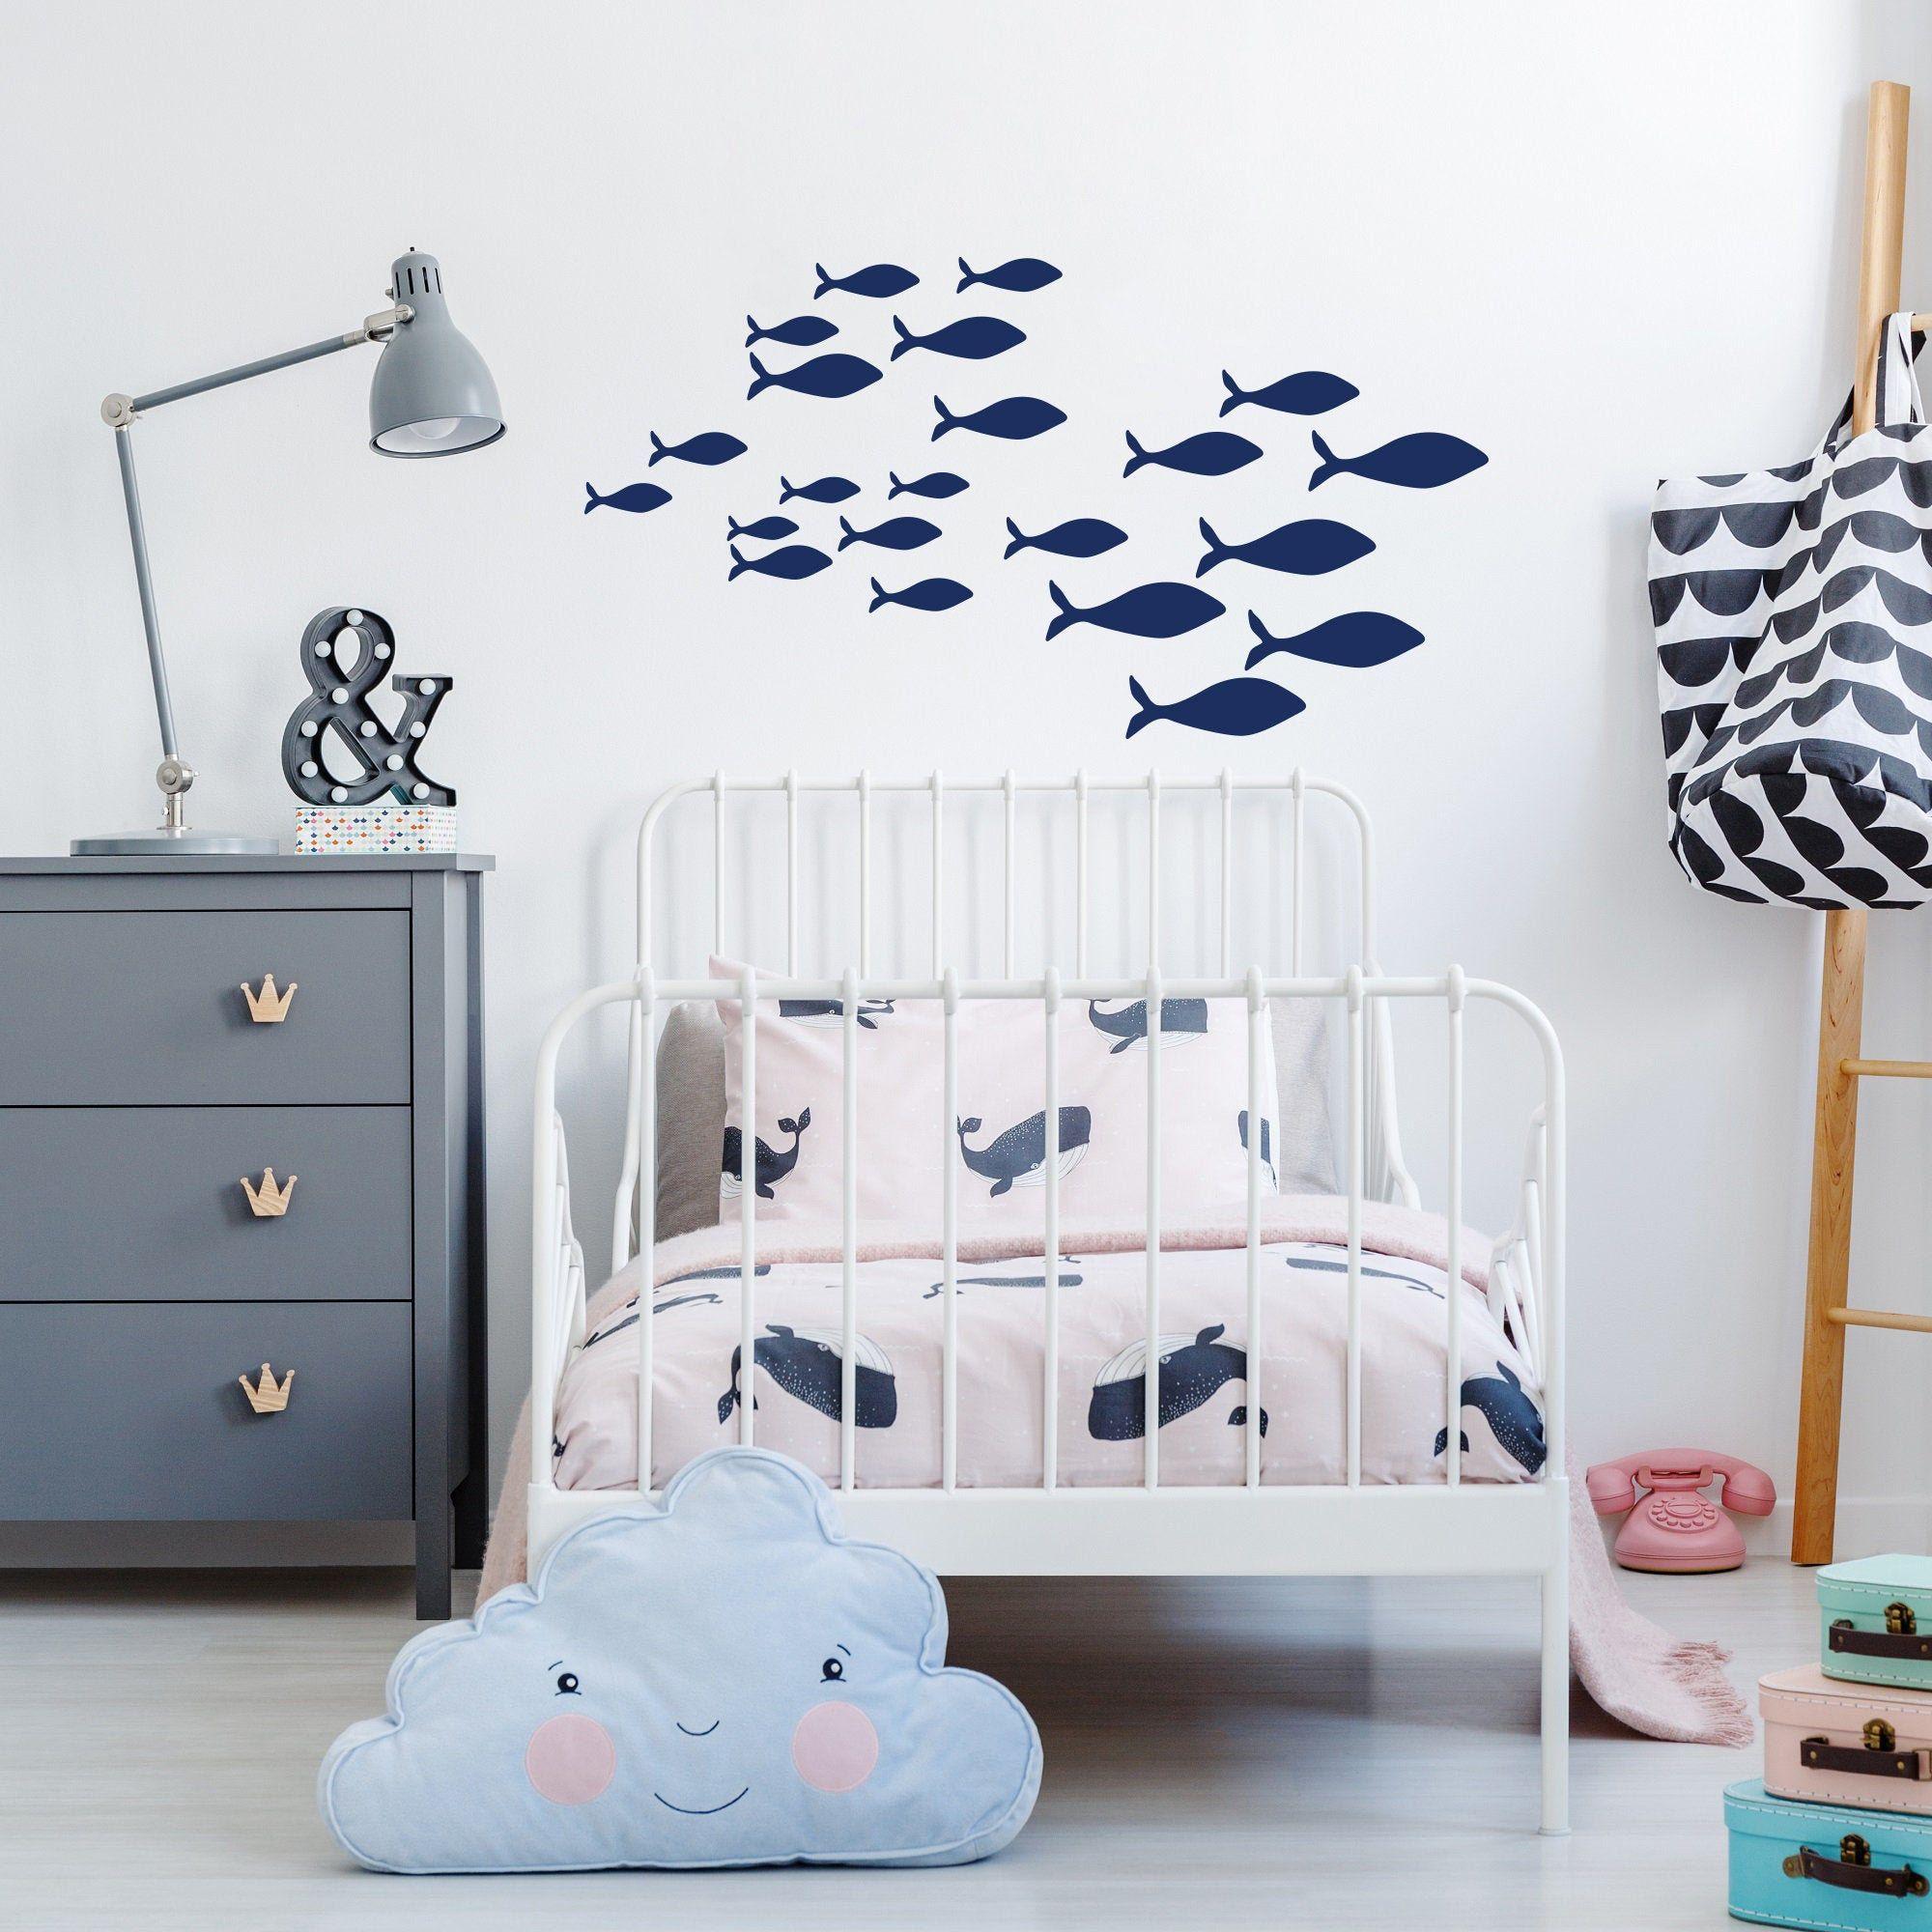 School Of Fish Decal Nursery Wall Decal School Of Fish Wall Etsy Fish Wall Decor Nursery Wall Decals Baby Room Decor